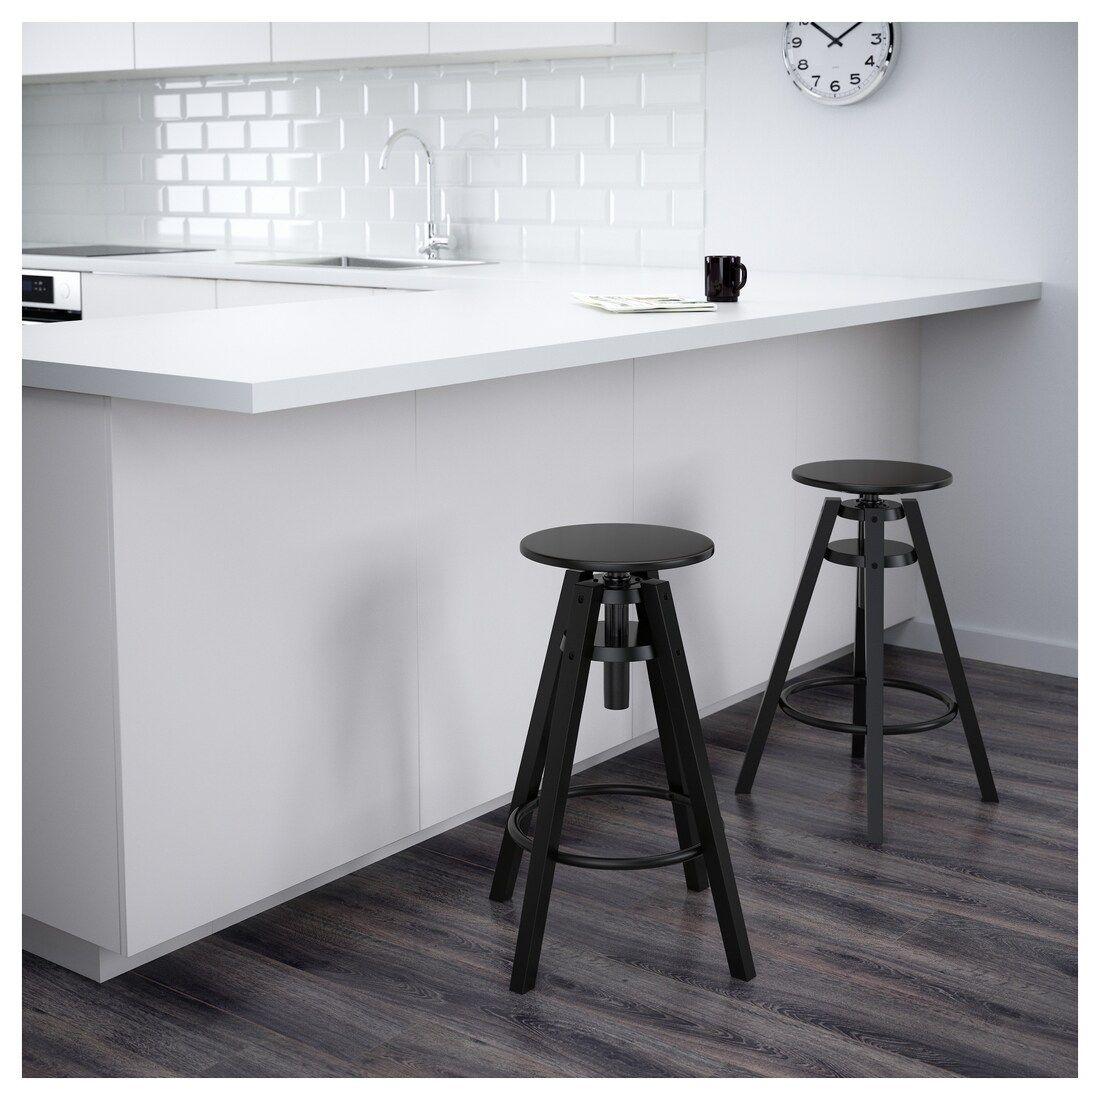 Hoge Tafel Keuken Ikea